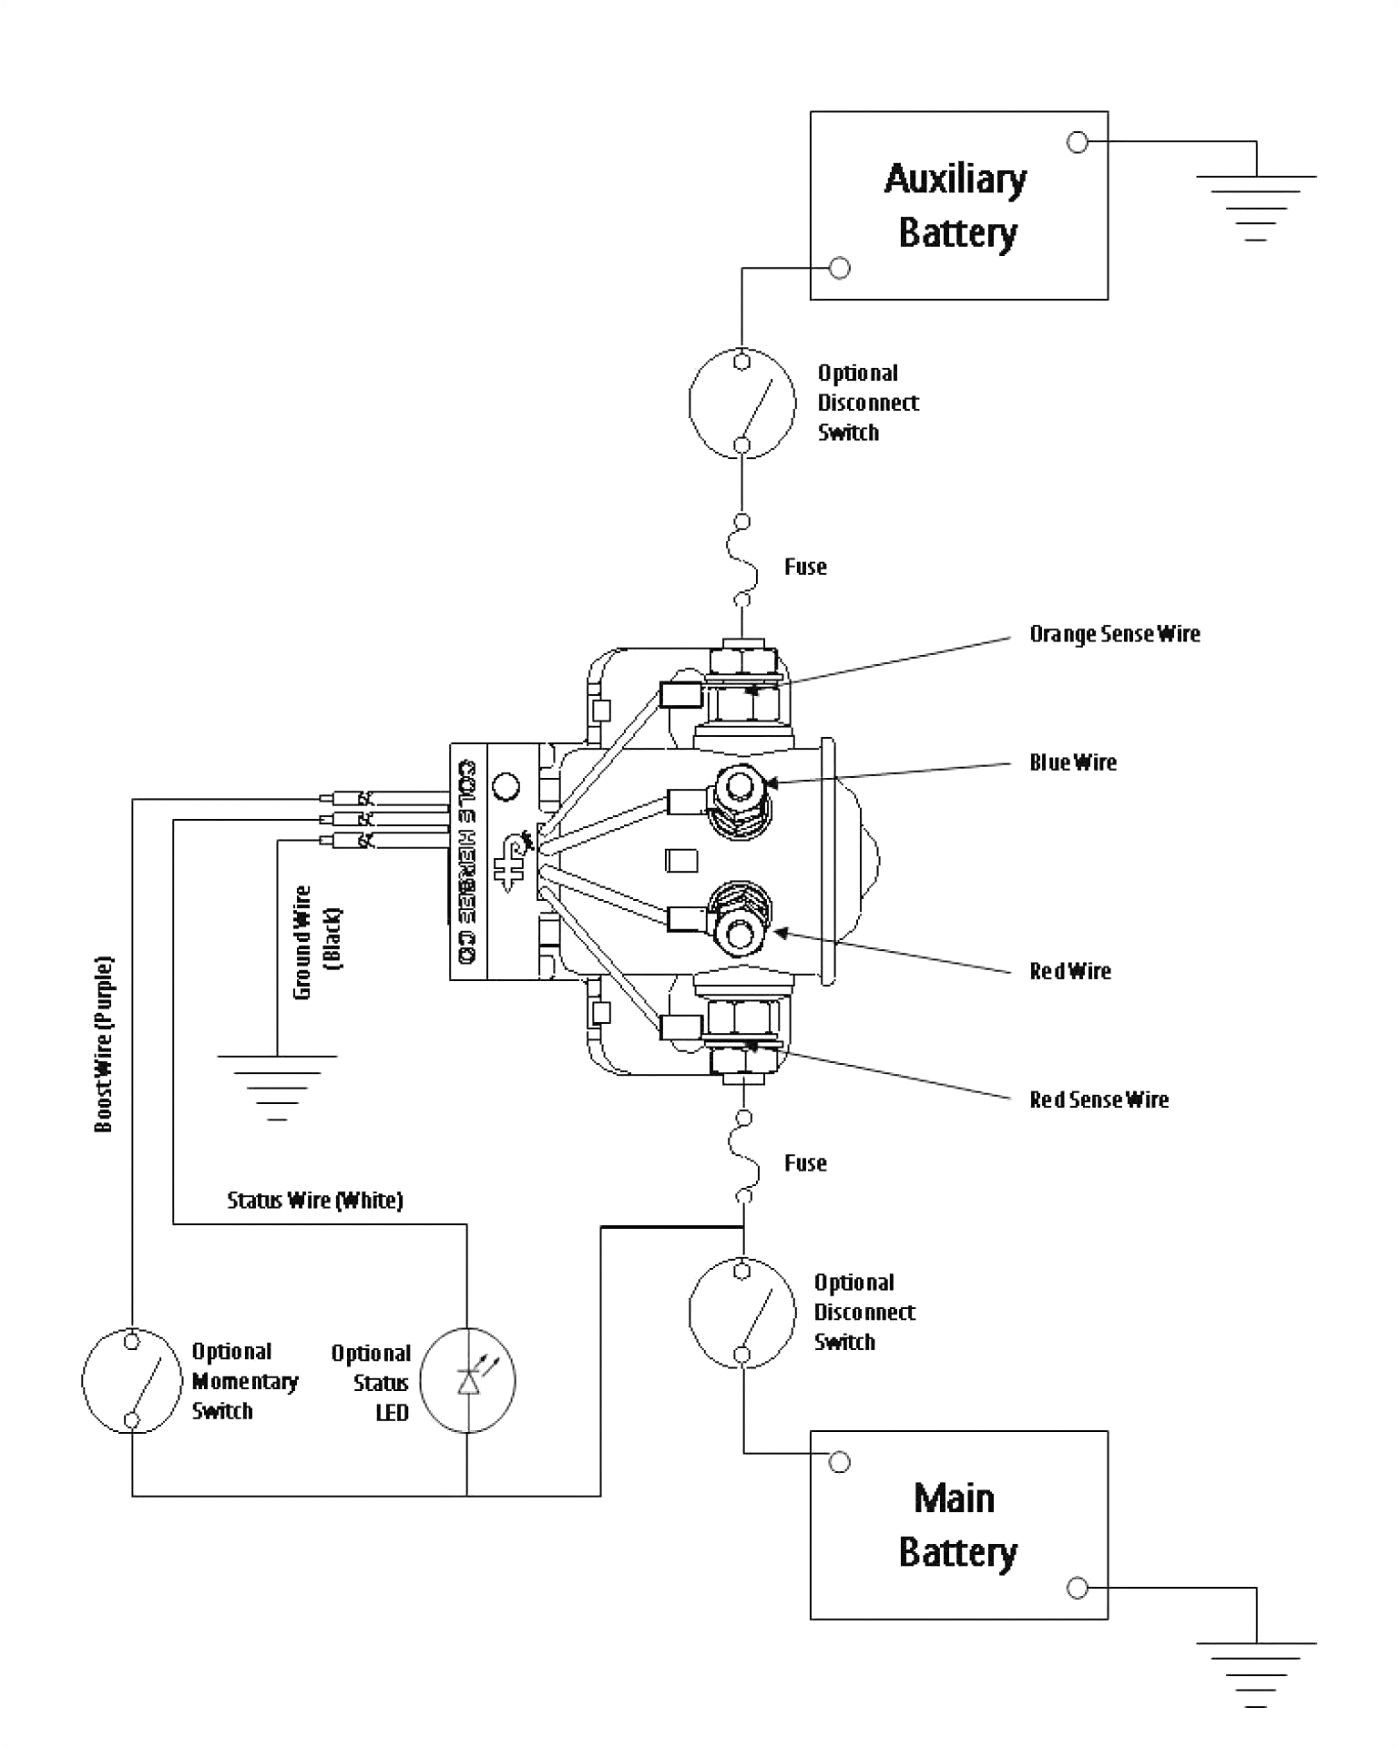 Plow Light Wiring Free Download Wiring Diagrams Pictures Wiring